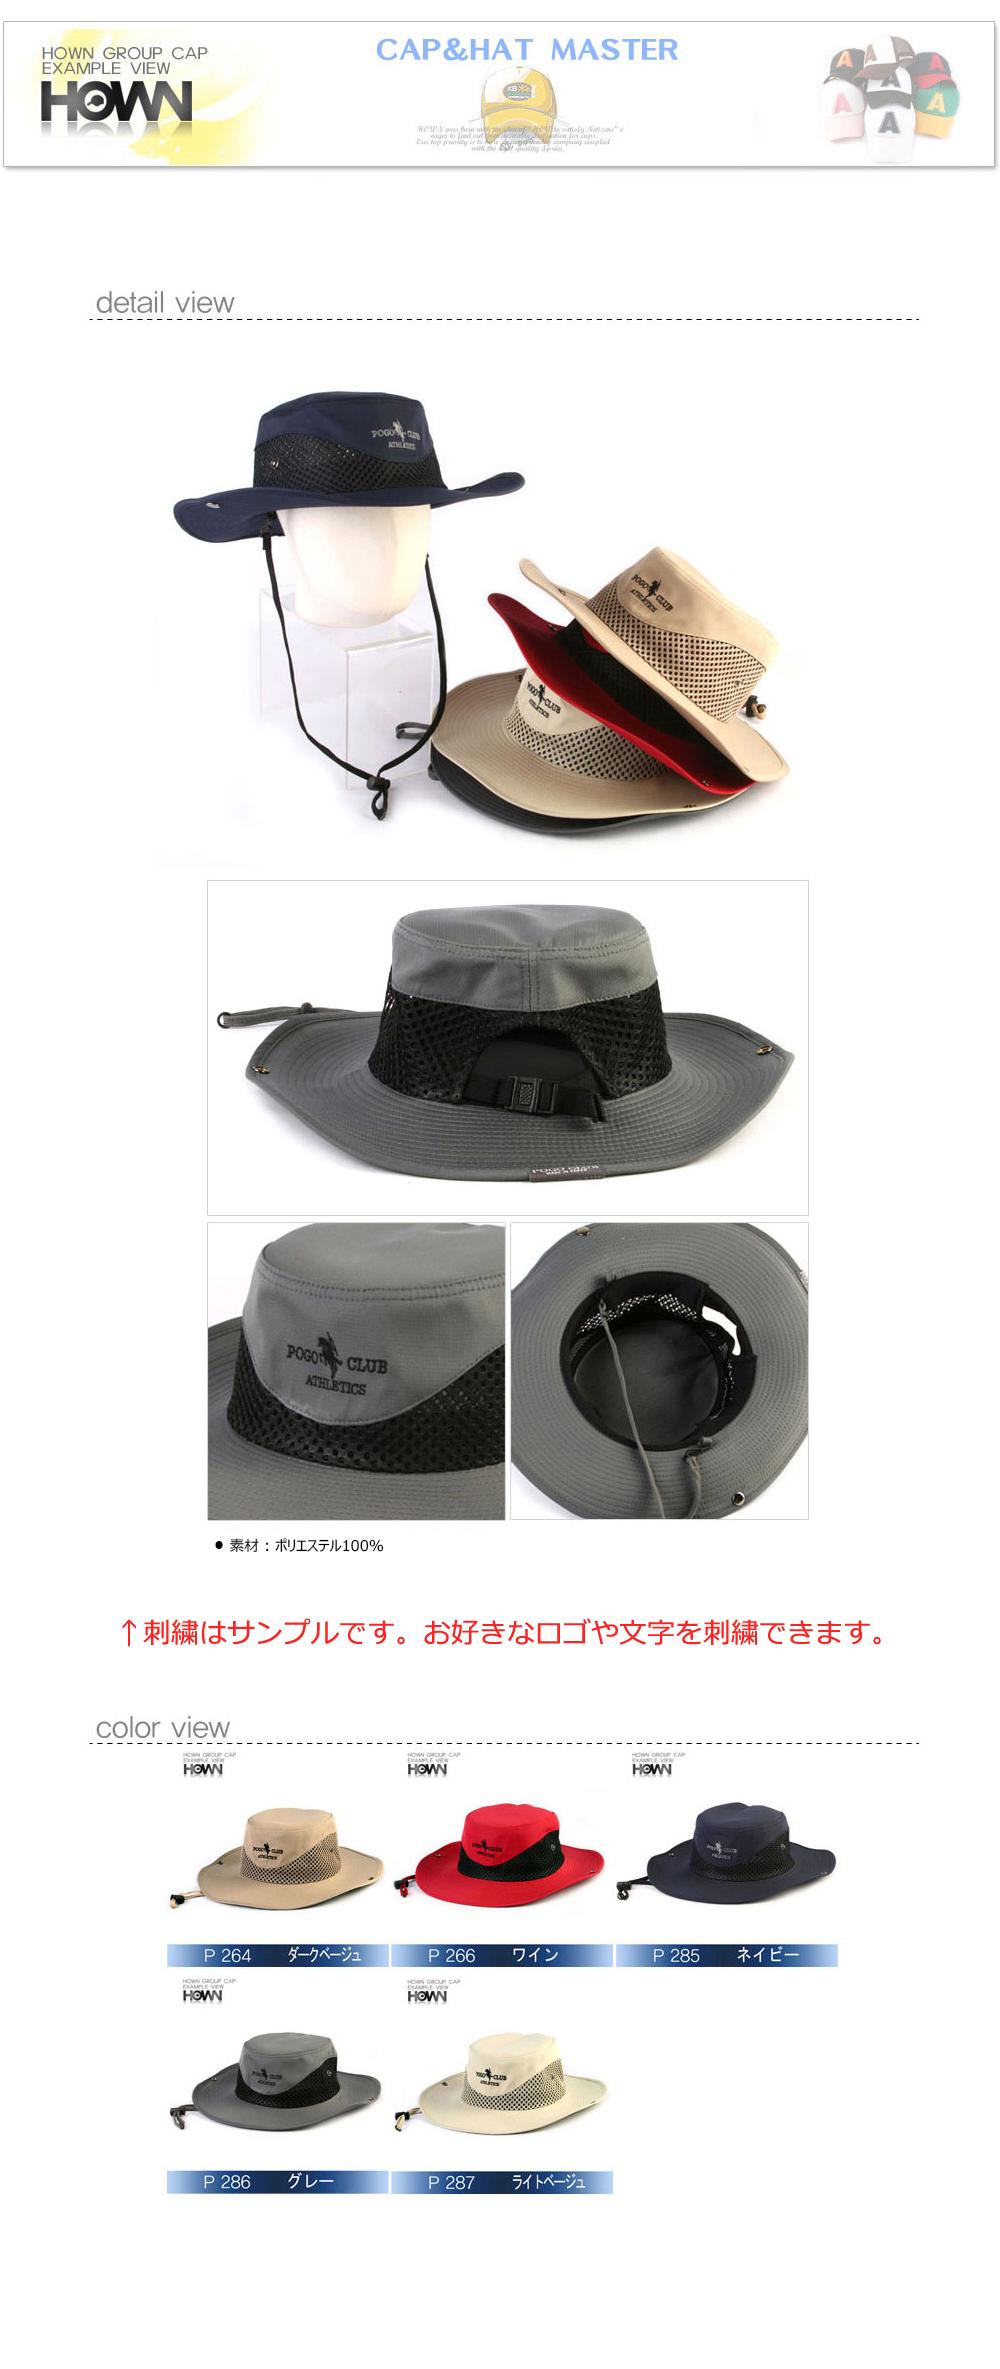 P264 P266 P285 P286 P287 1点から製作可能!本格的3D刺繍も!名前入れ 刺繍 プリント オリジナルキャップ 登山帽子 イベント用  学校行事 サークル  アウトドアハット 登山帽子に刺繍を!